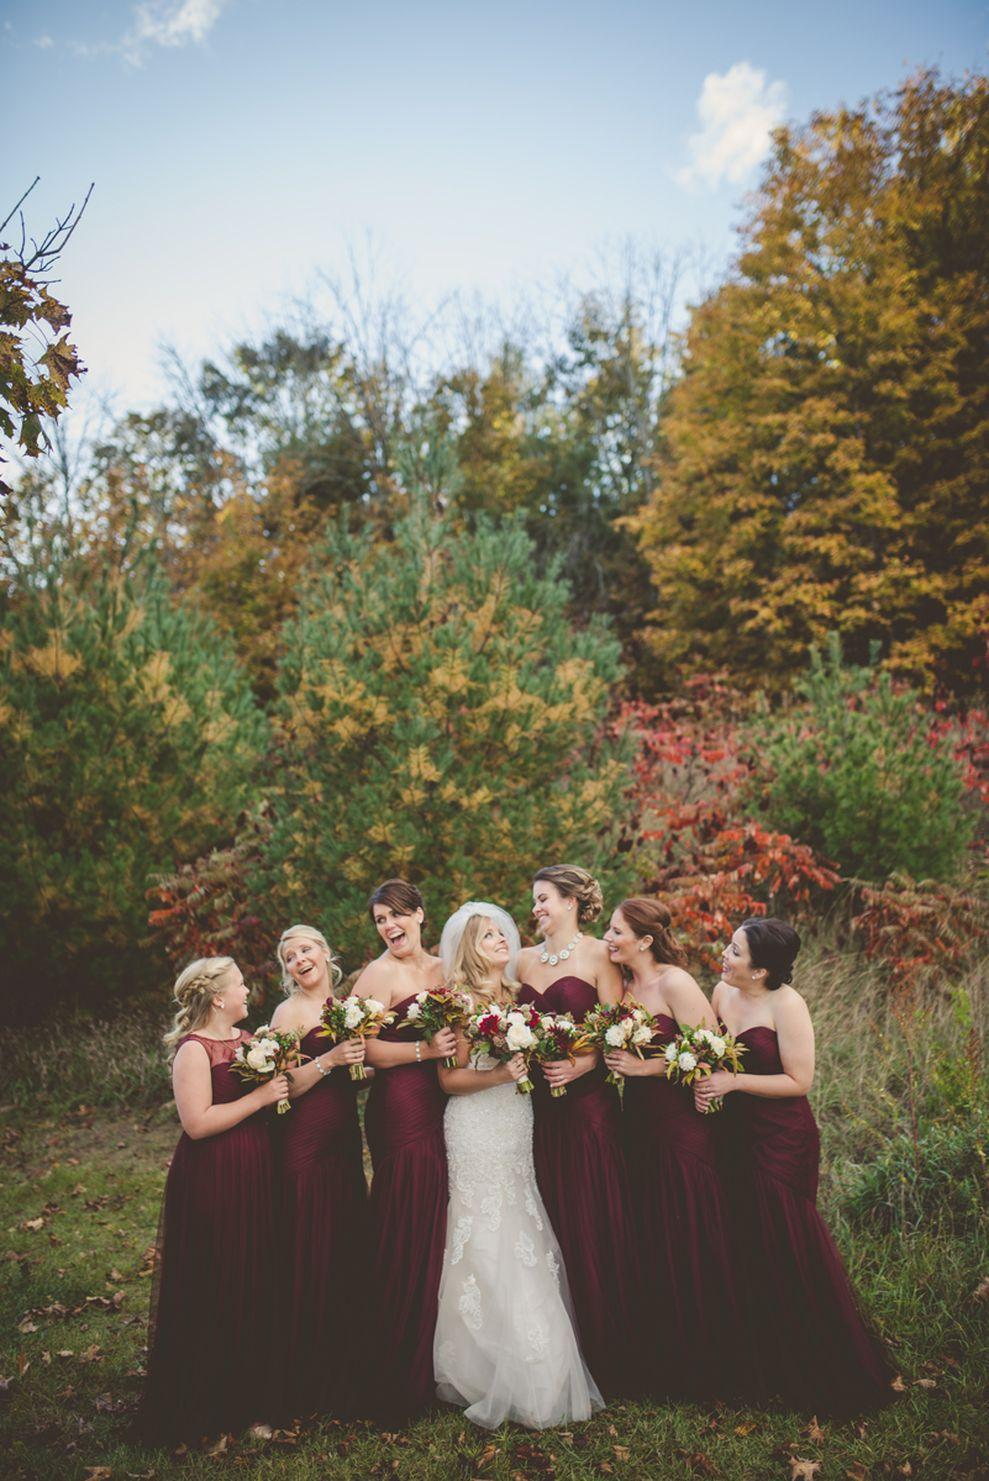 Courthouse wedding dresses under $100   Elegant Vineyard Wedding Dresses Ideas Perfect for Casual